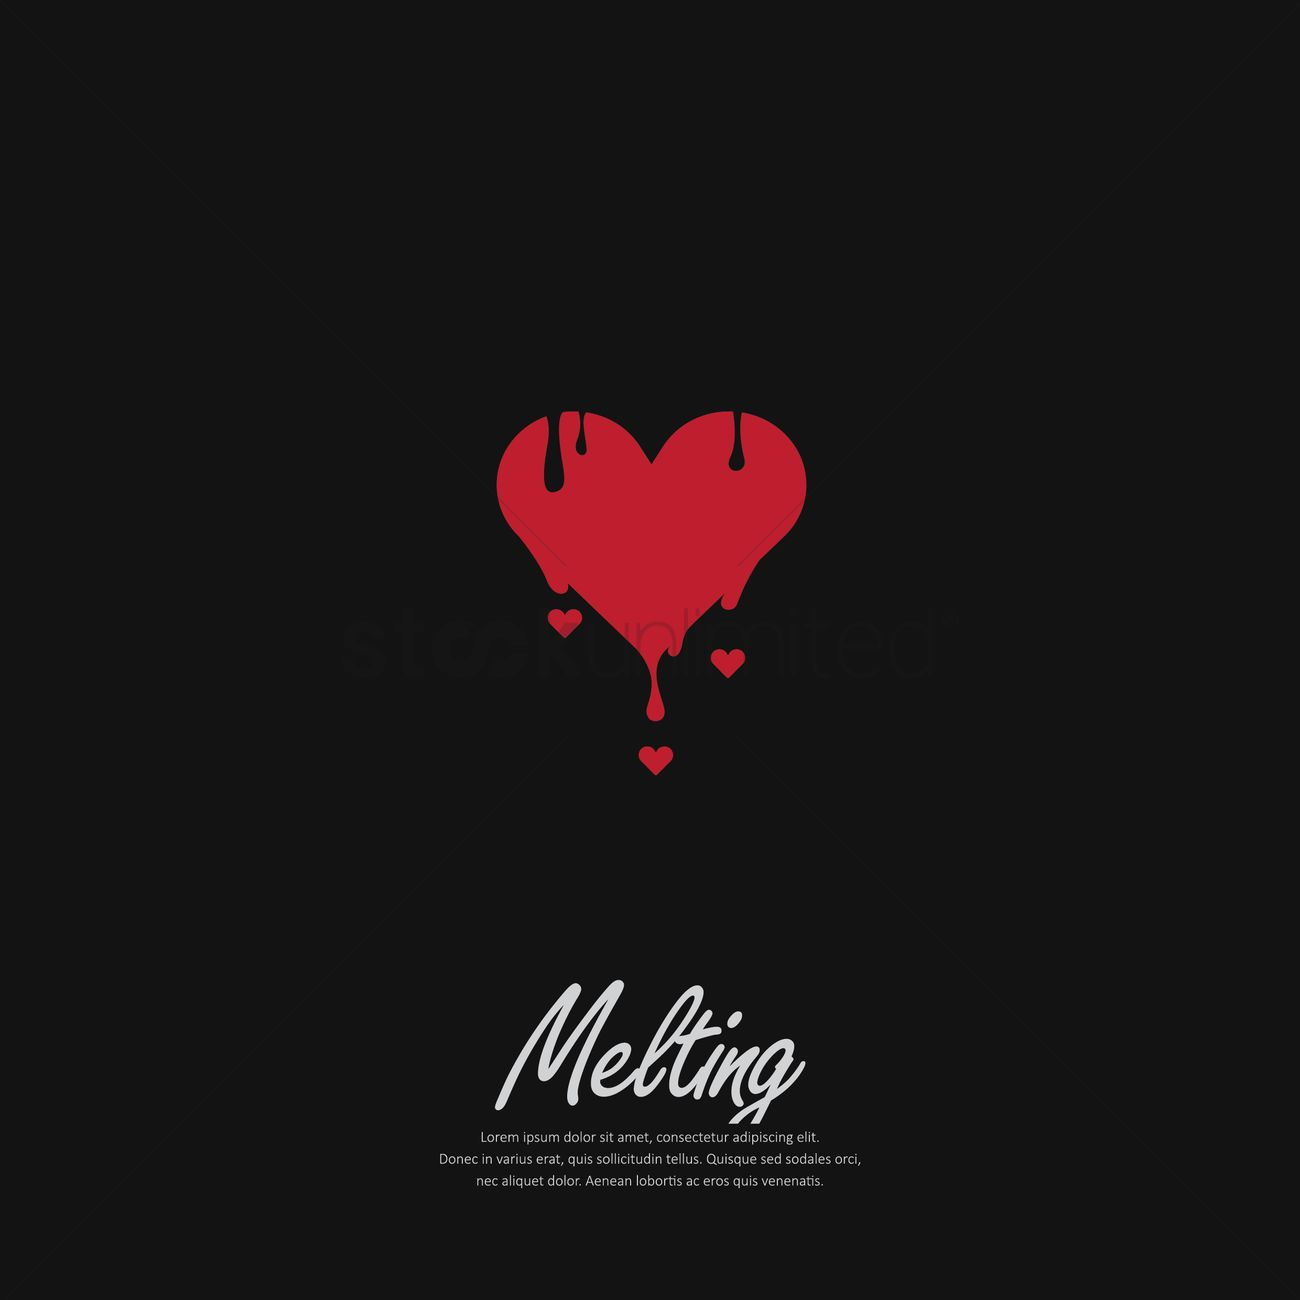 Download Png Melting Heart Tranparent Background - Corazon Derritiendose  Png, Transparent Png - kindpng